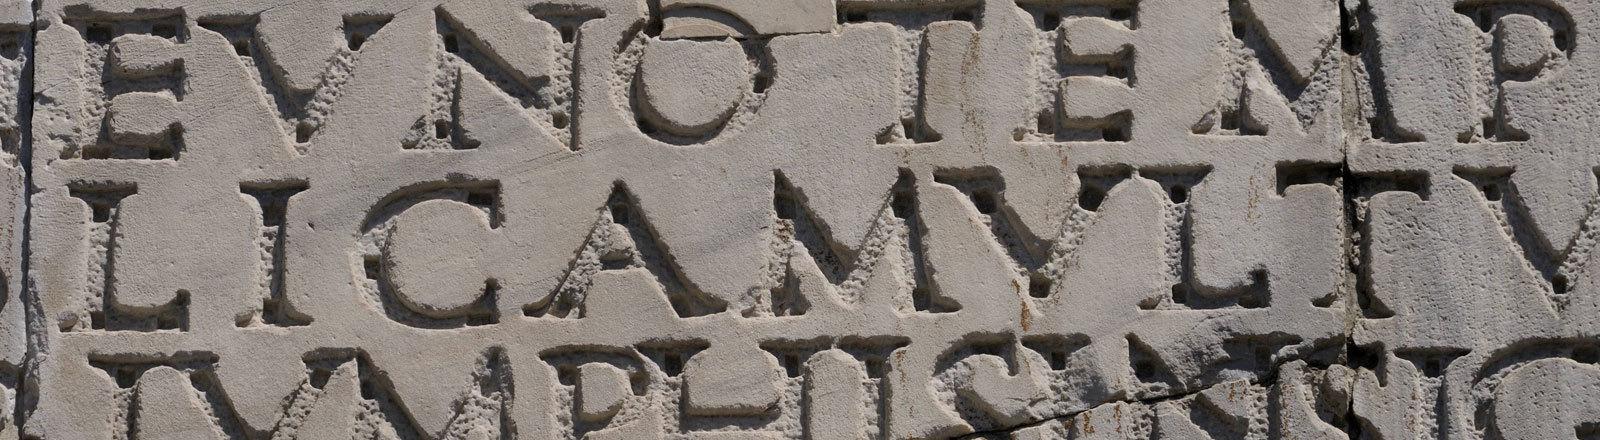 Römische Inschrift am Konstantinsbogen, Rom, Italien, Europa